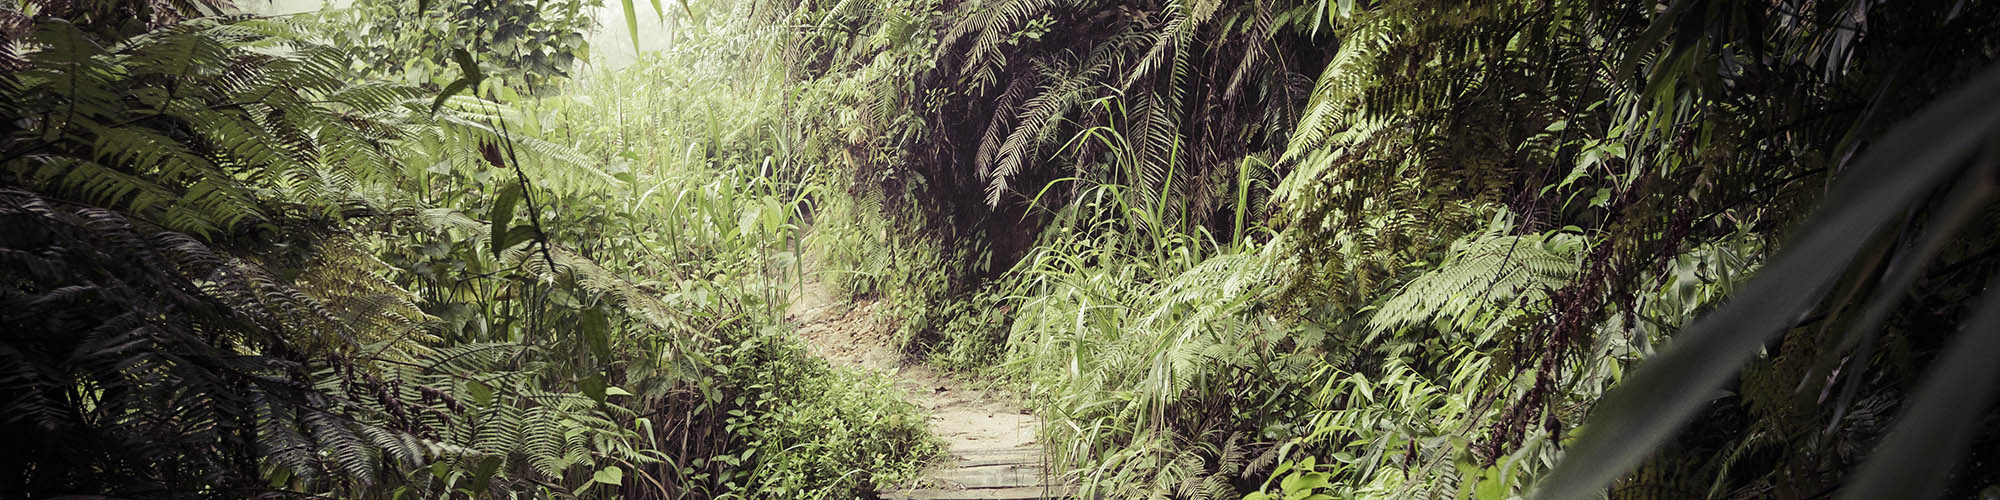 Forêt tropicale, Sinharaja, Sri Lanka